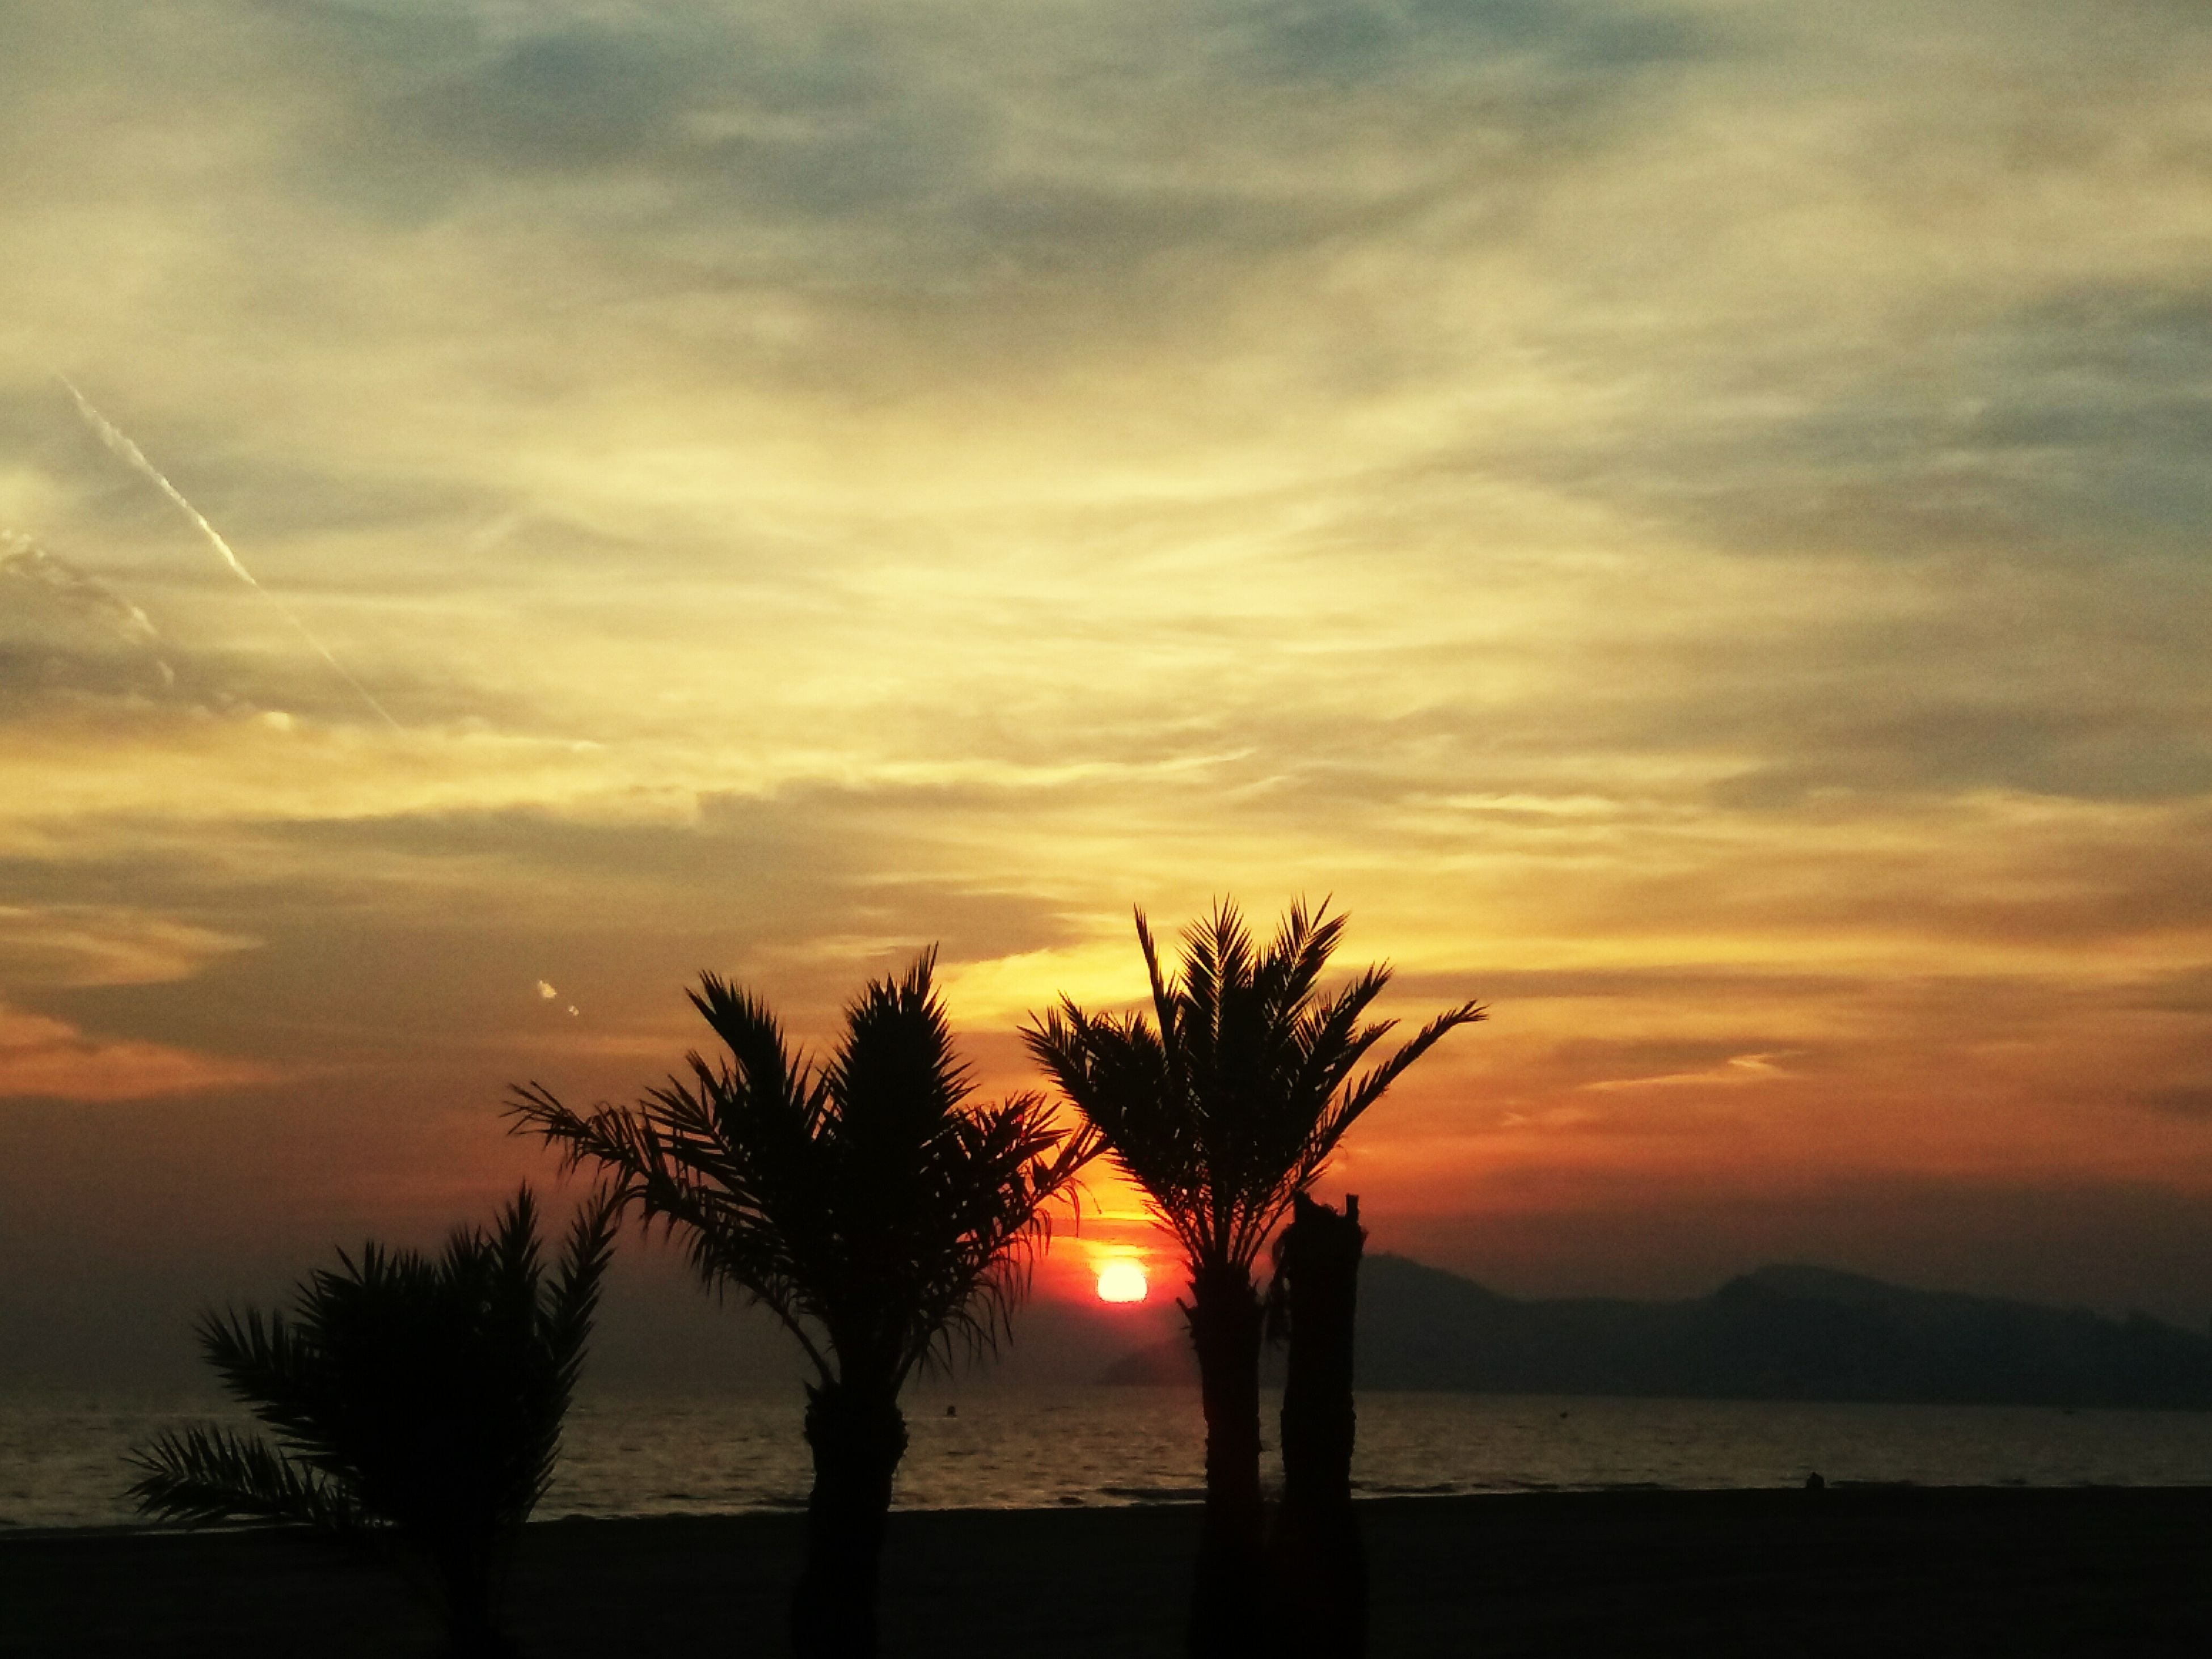 sunset, silhouette, scenics, tranquil scene, tranquility, sky, beauty in nature, water, sea, sun, orange color, idyllic, nature, horizon over water, tree, cloud - sky, cloud, dramatic sky, beach, majestic